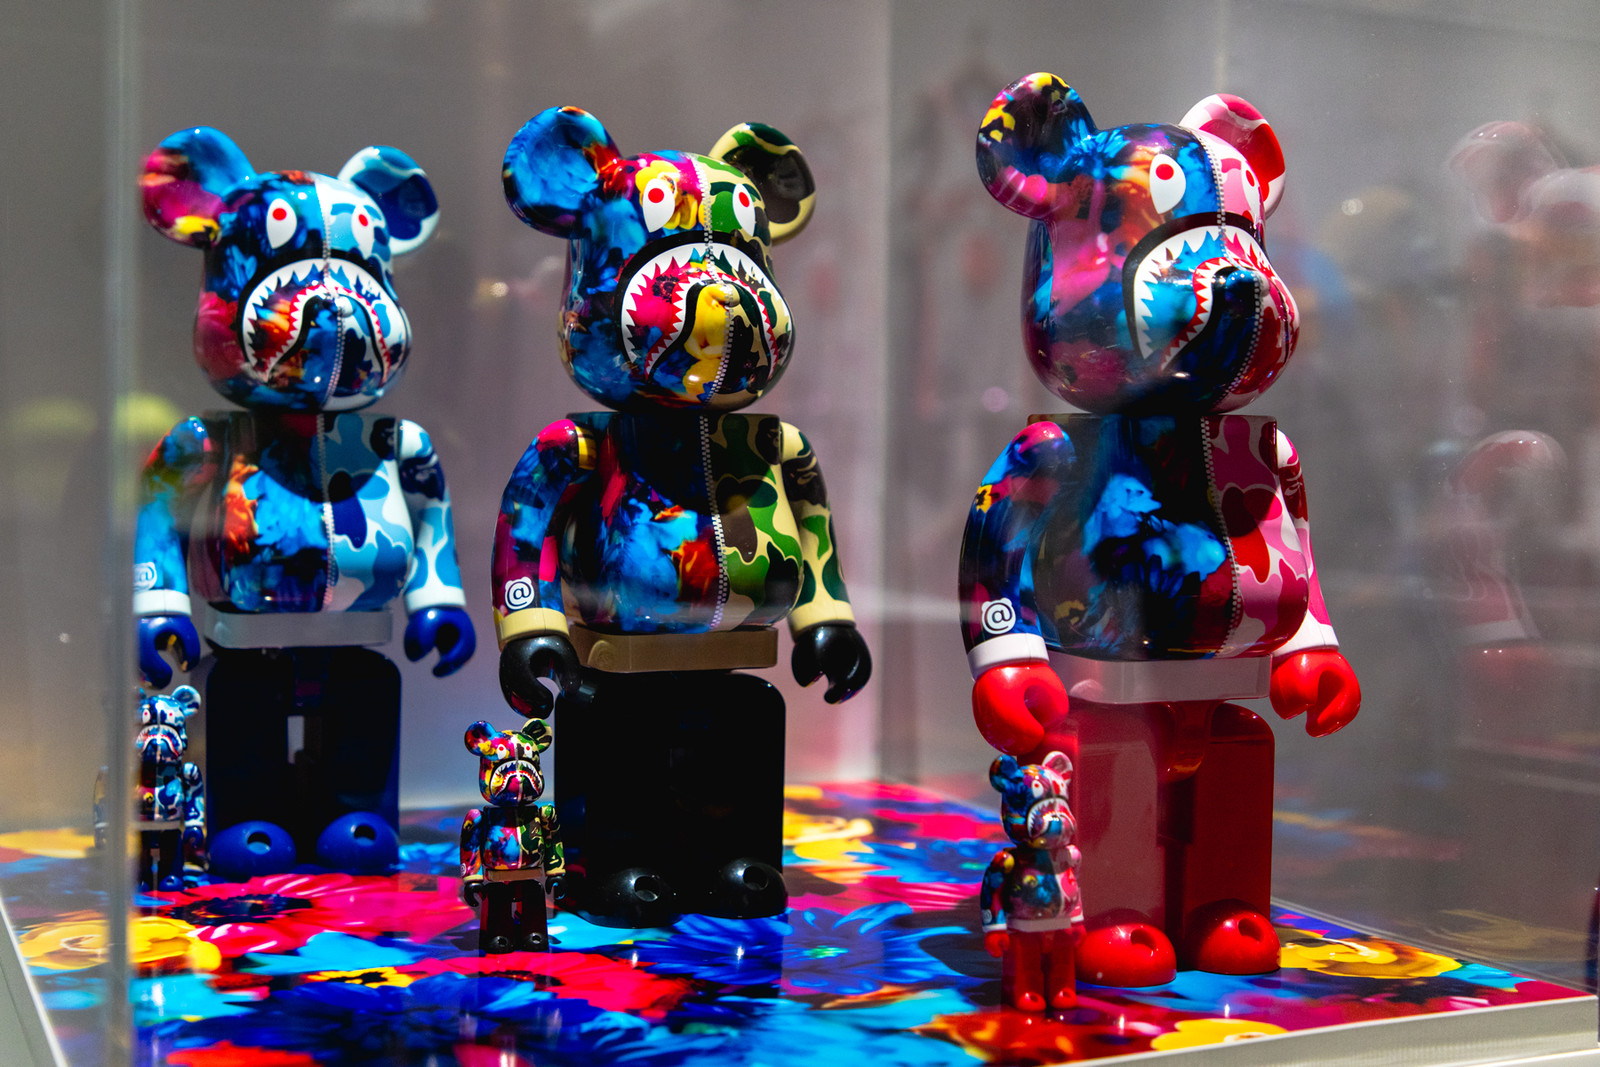 Best BAPE 25th Anniversary CollaborationBAPE XXV exhibitions a bathing ape nigo japan tokyo adidas casio g-shock japan tokyo spalding wilson adidas Swarovski medicom toy bearbrick